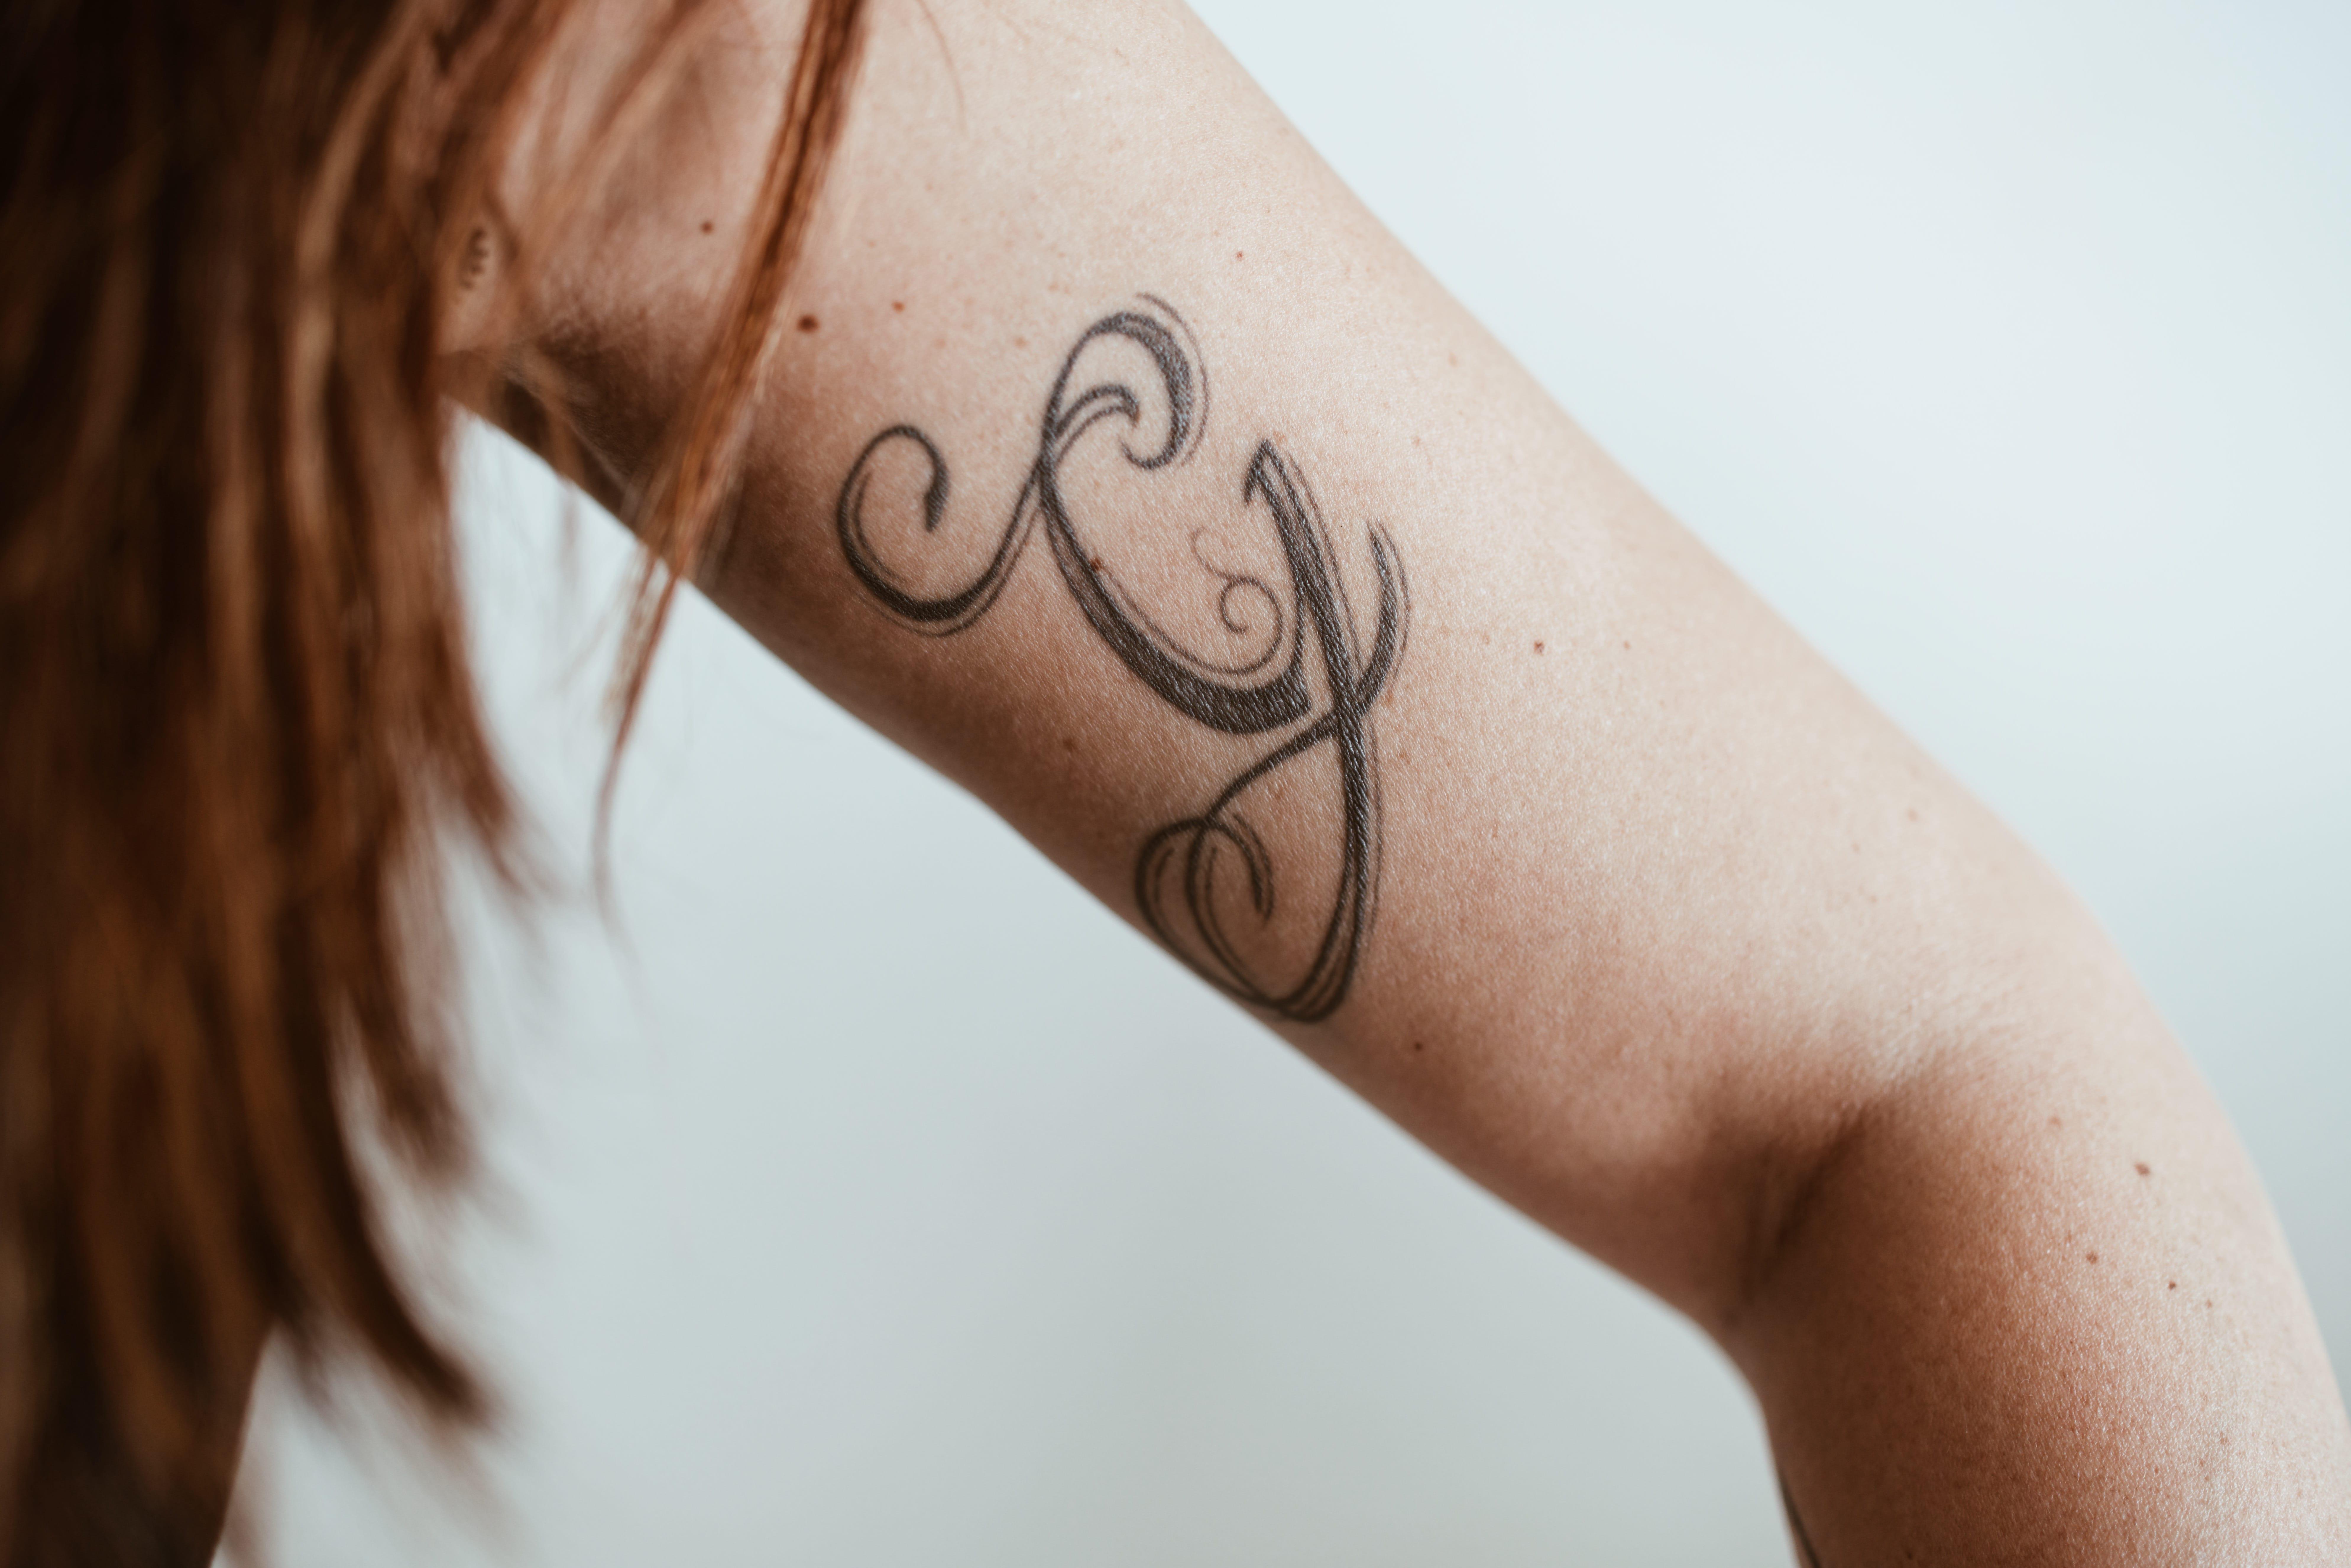 Mes Tatouages Dorisknowsfashion Blog Mode Beaute Lifestyle